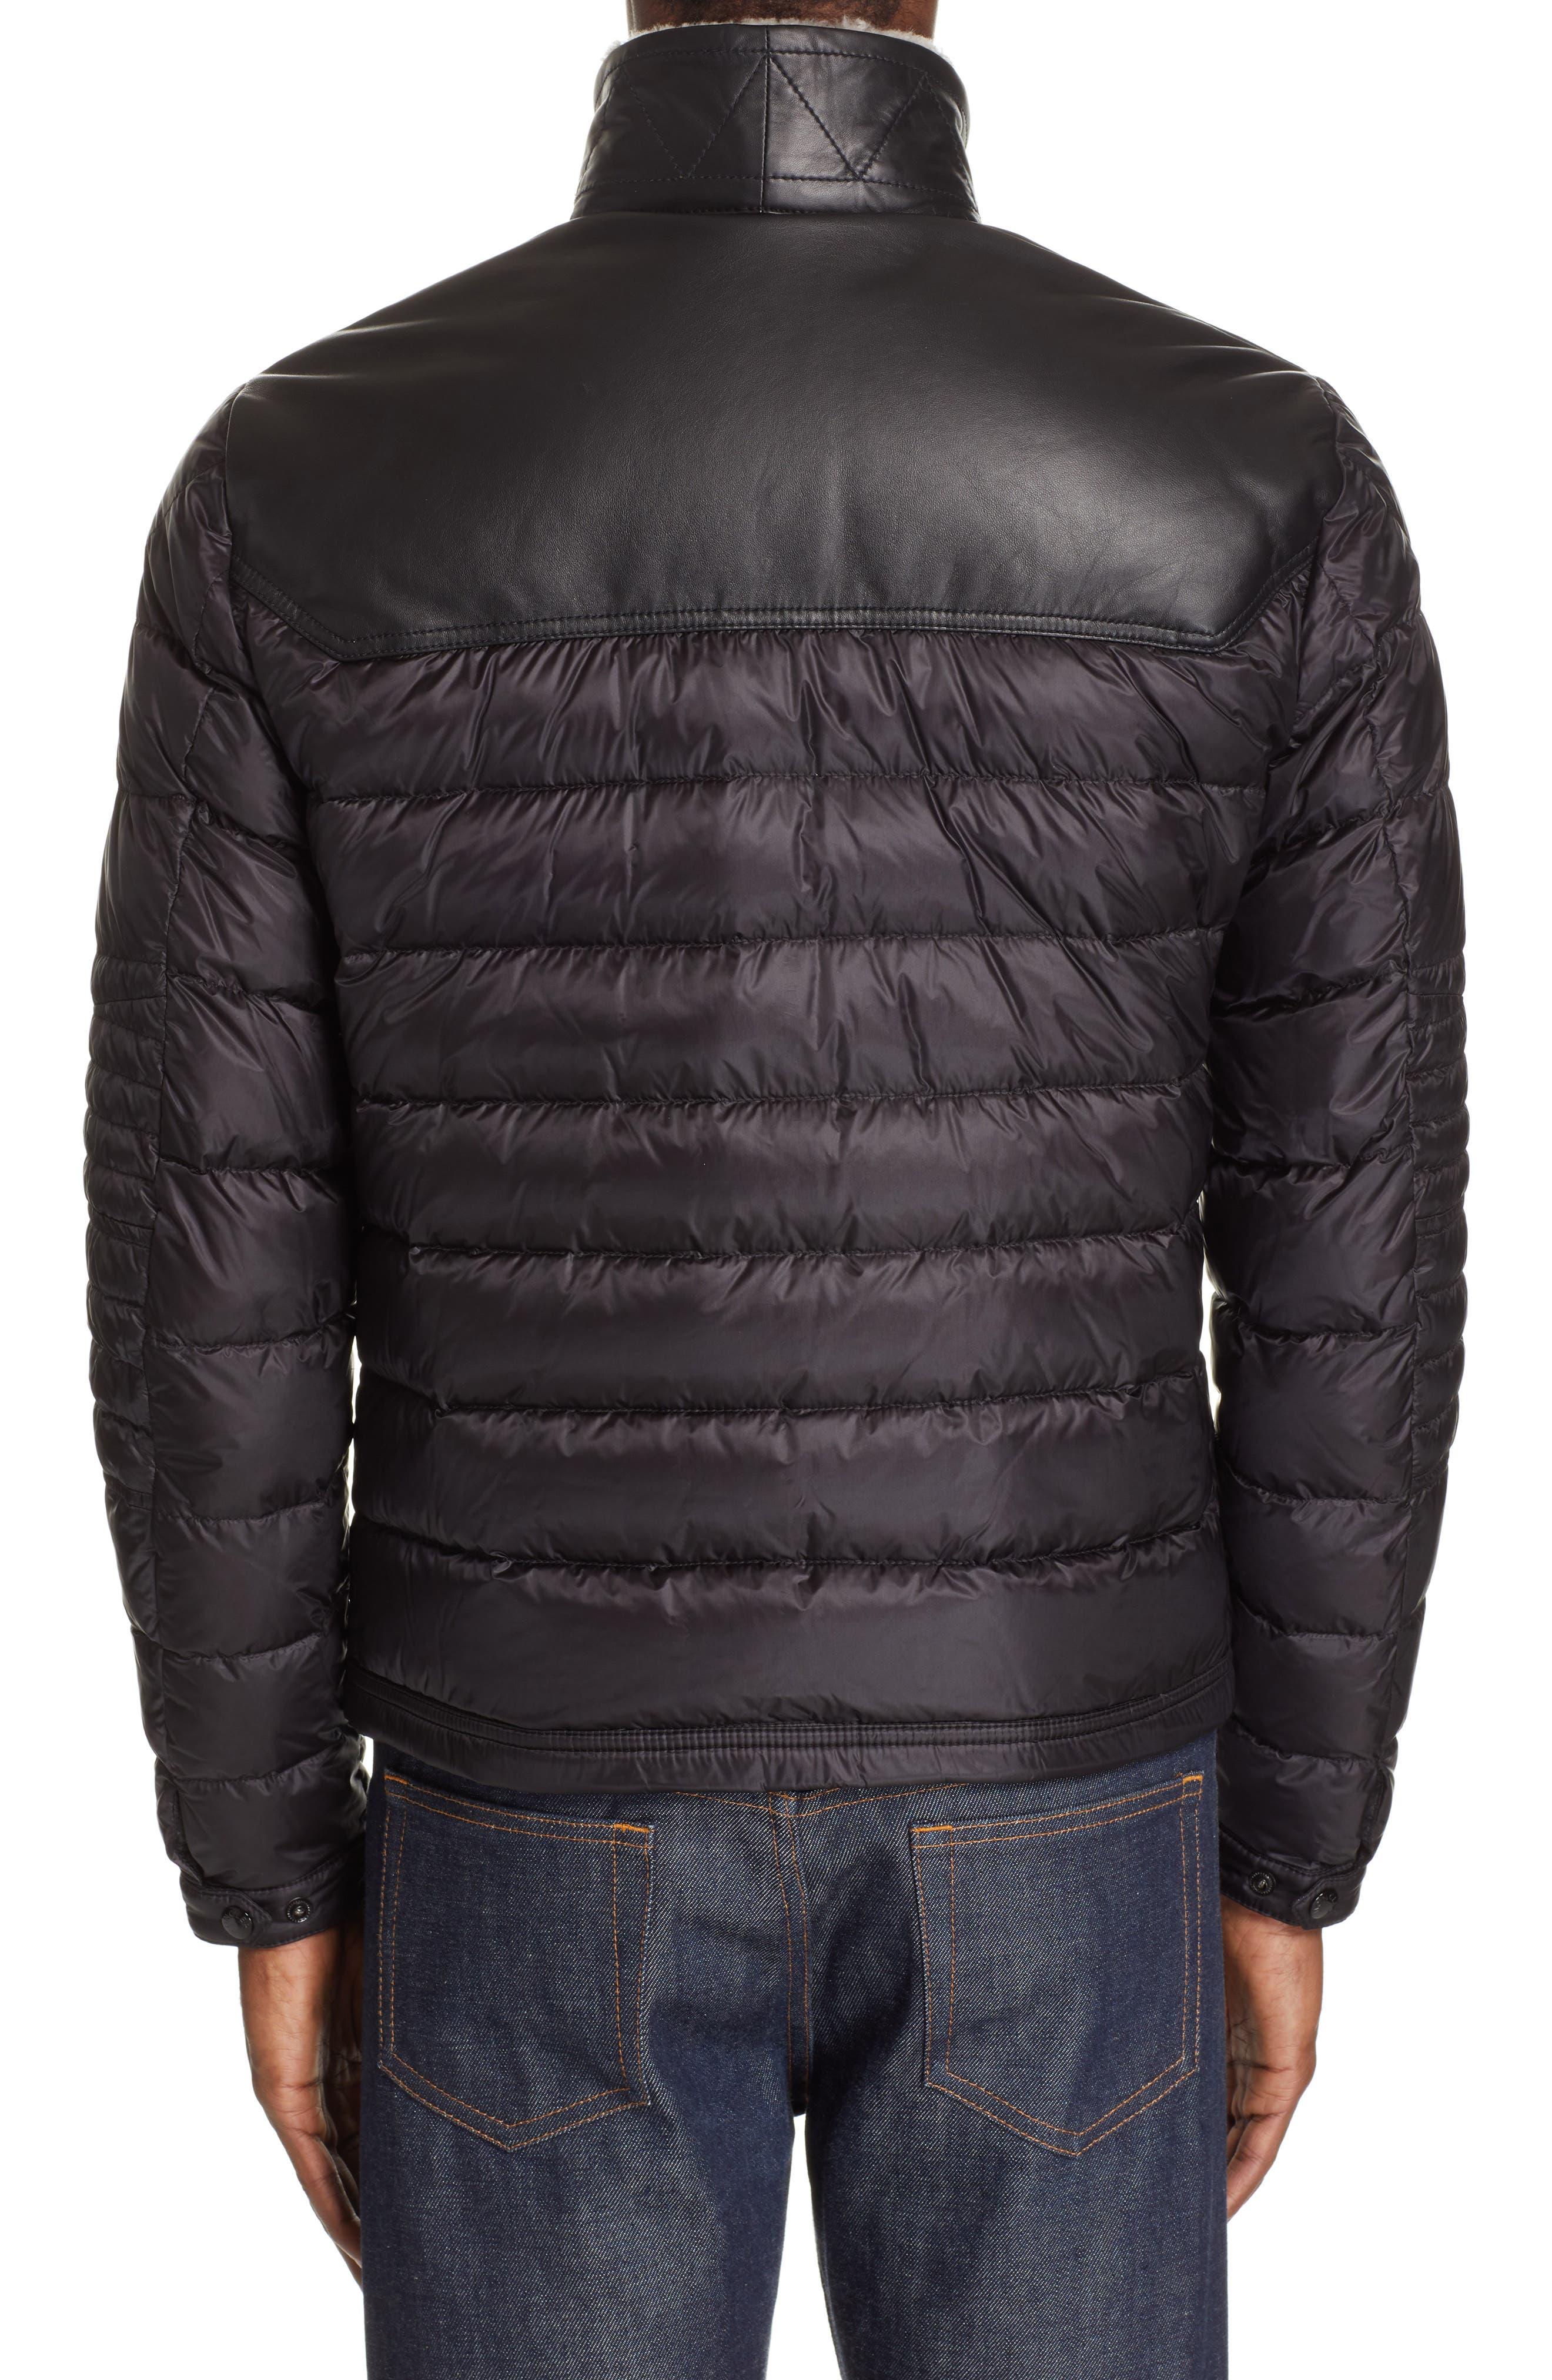 MONCLER, Vasserot Genuine Shearling Collar Jacket, Alternate thumbnail 3, color, BLACK